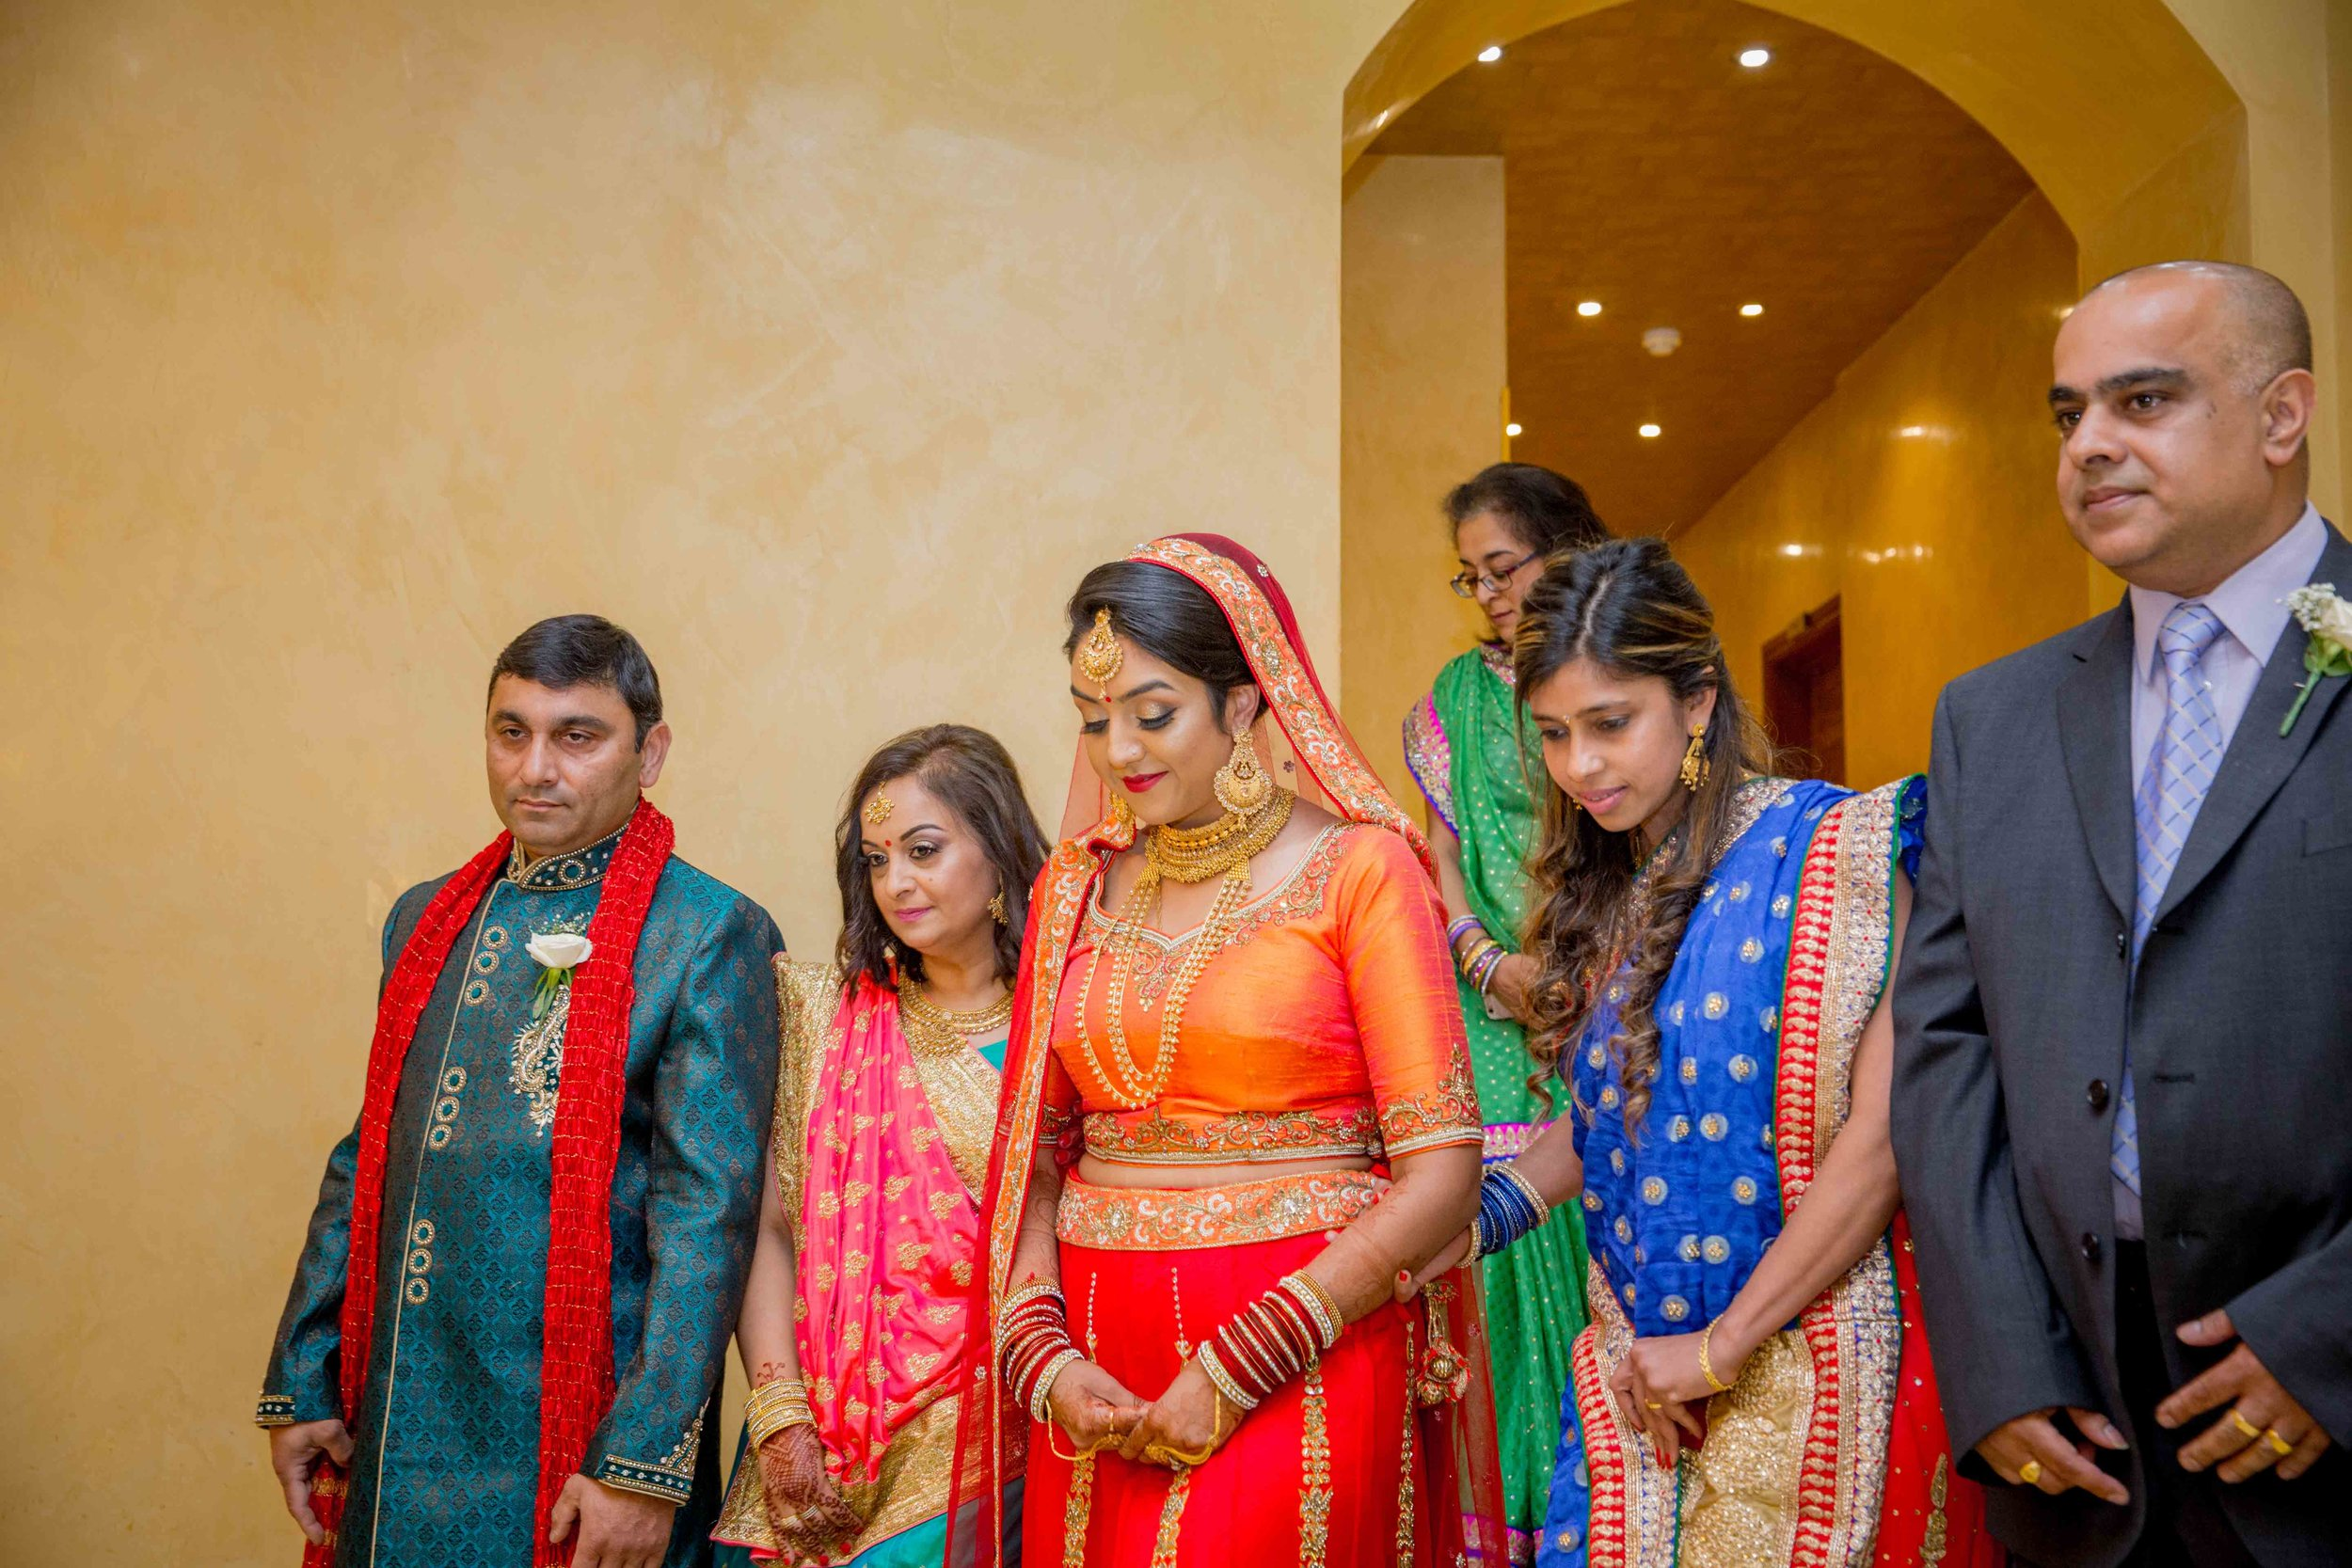 premier-banquetting-london-Hindu-asian-wedding-photographer-natalia-smith-photography-16.jpg